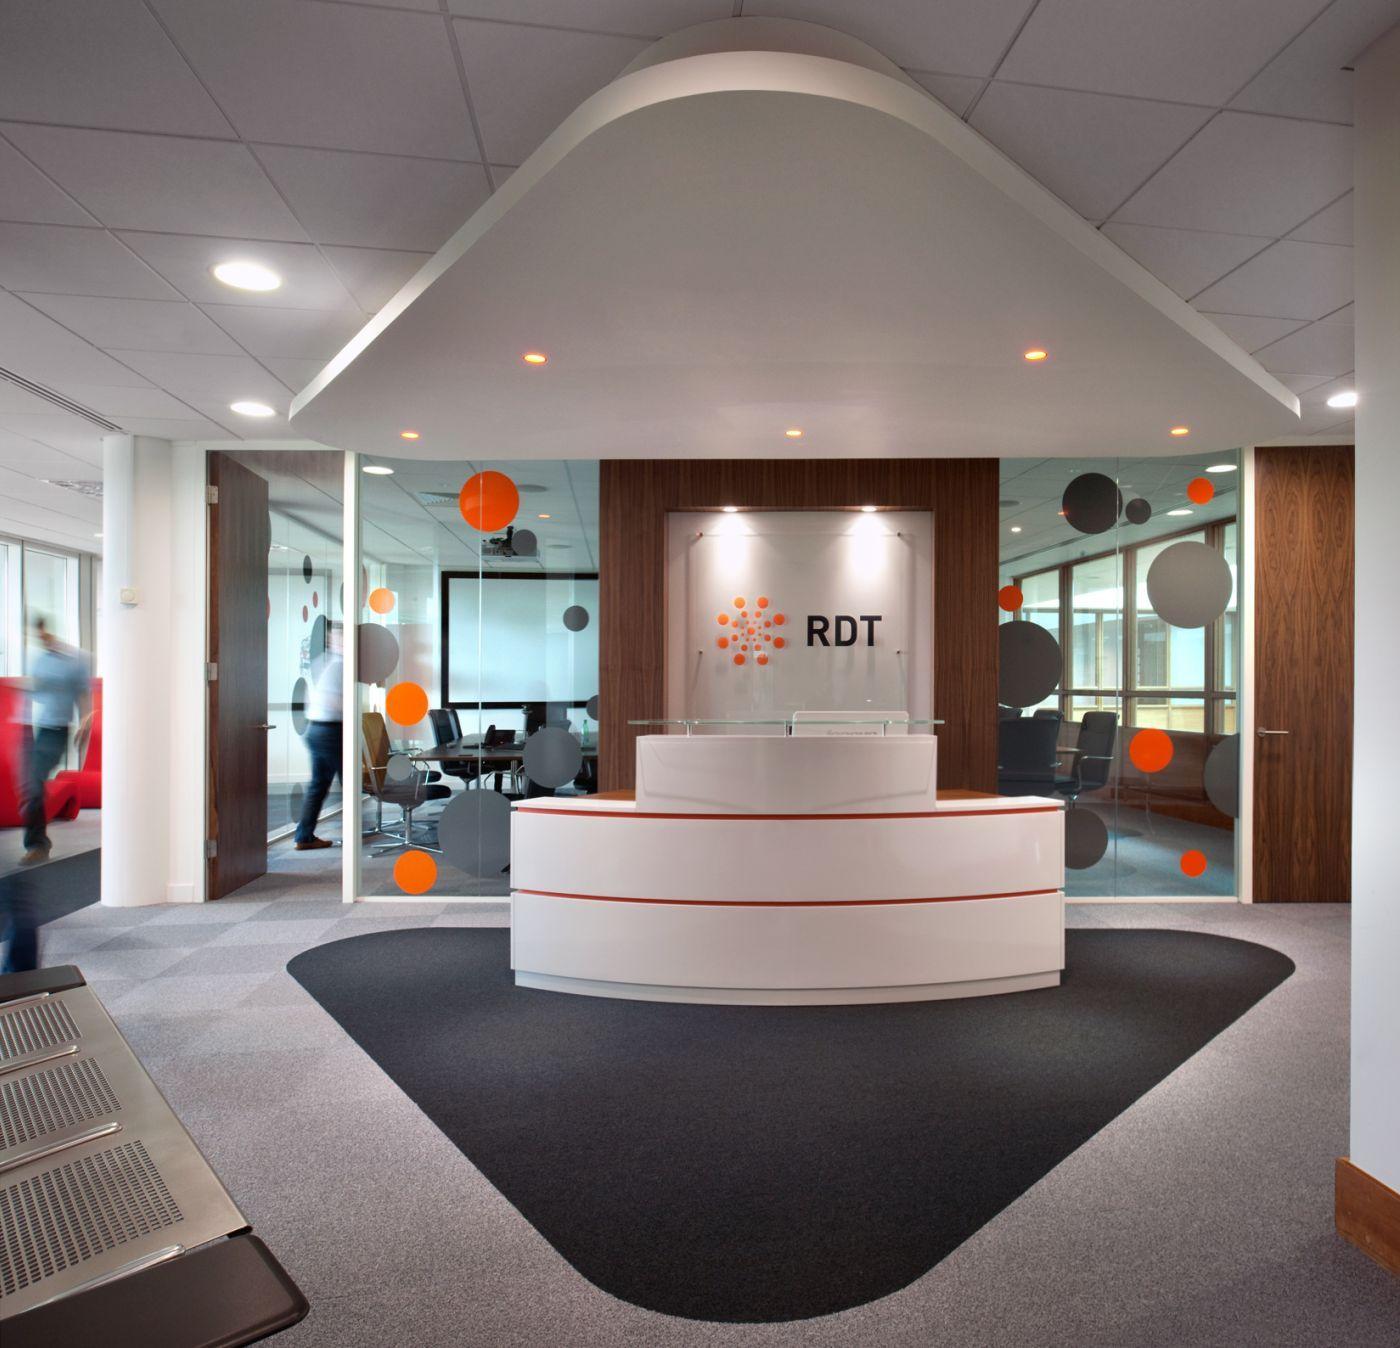 inspirational office design. Inspirational Office Design I